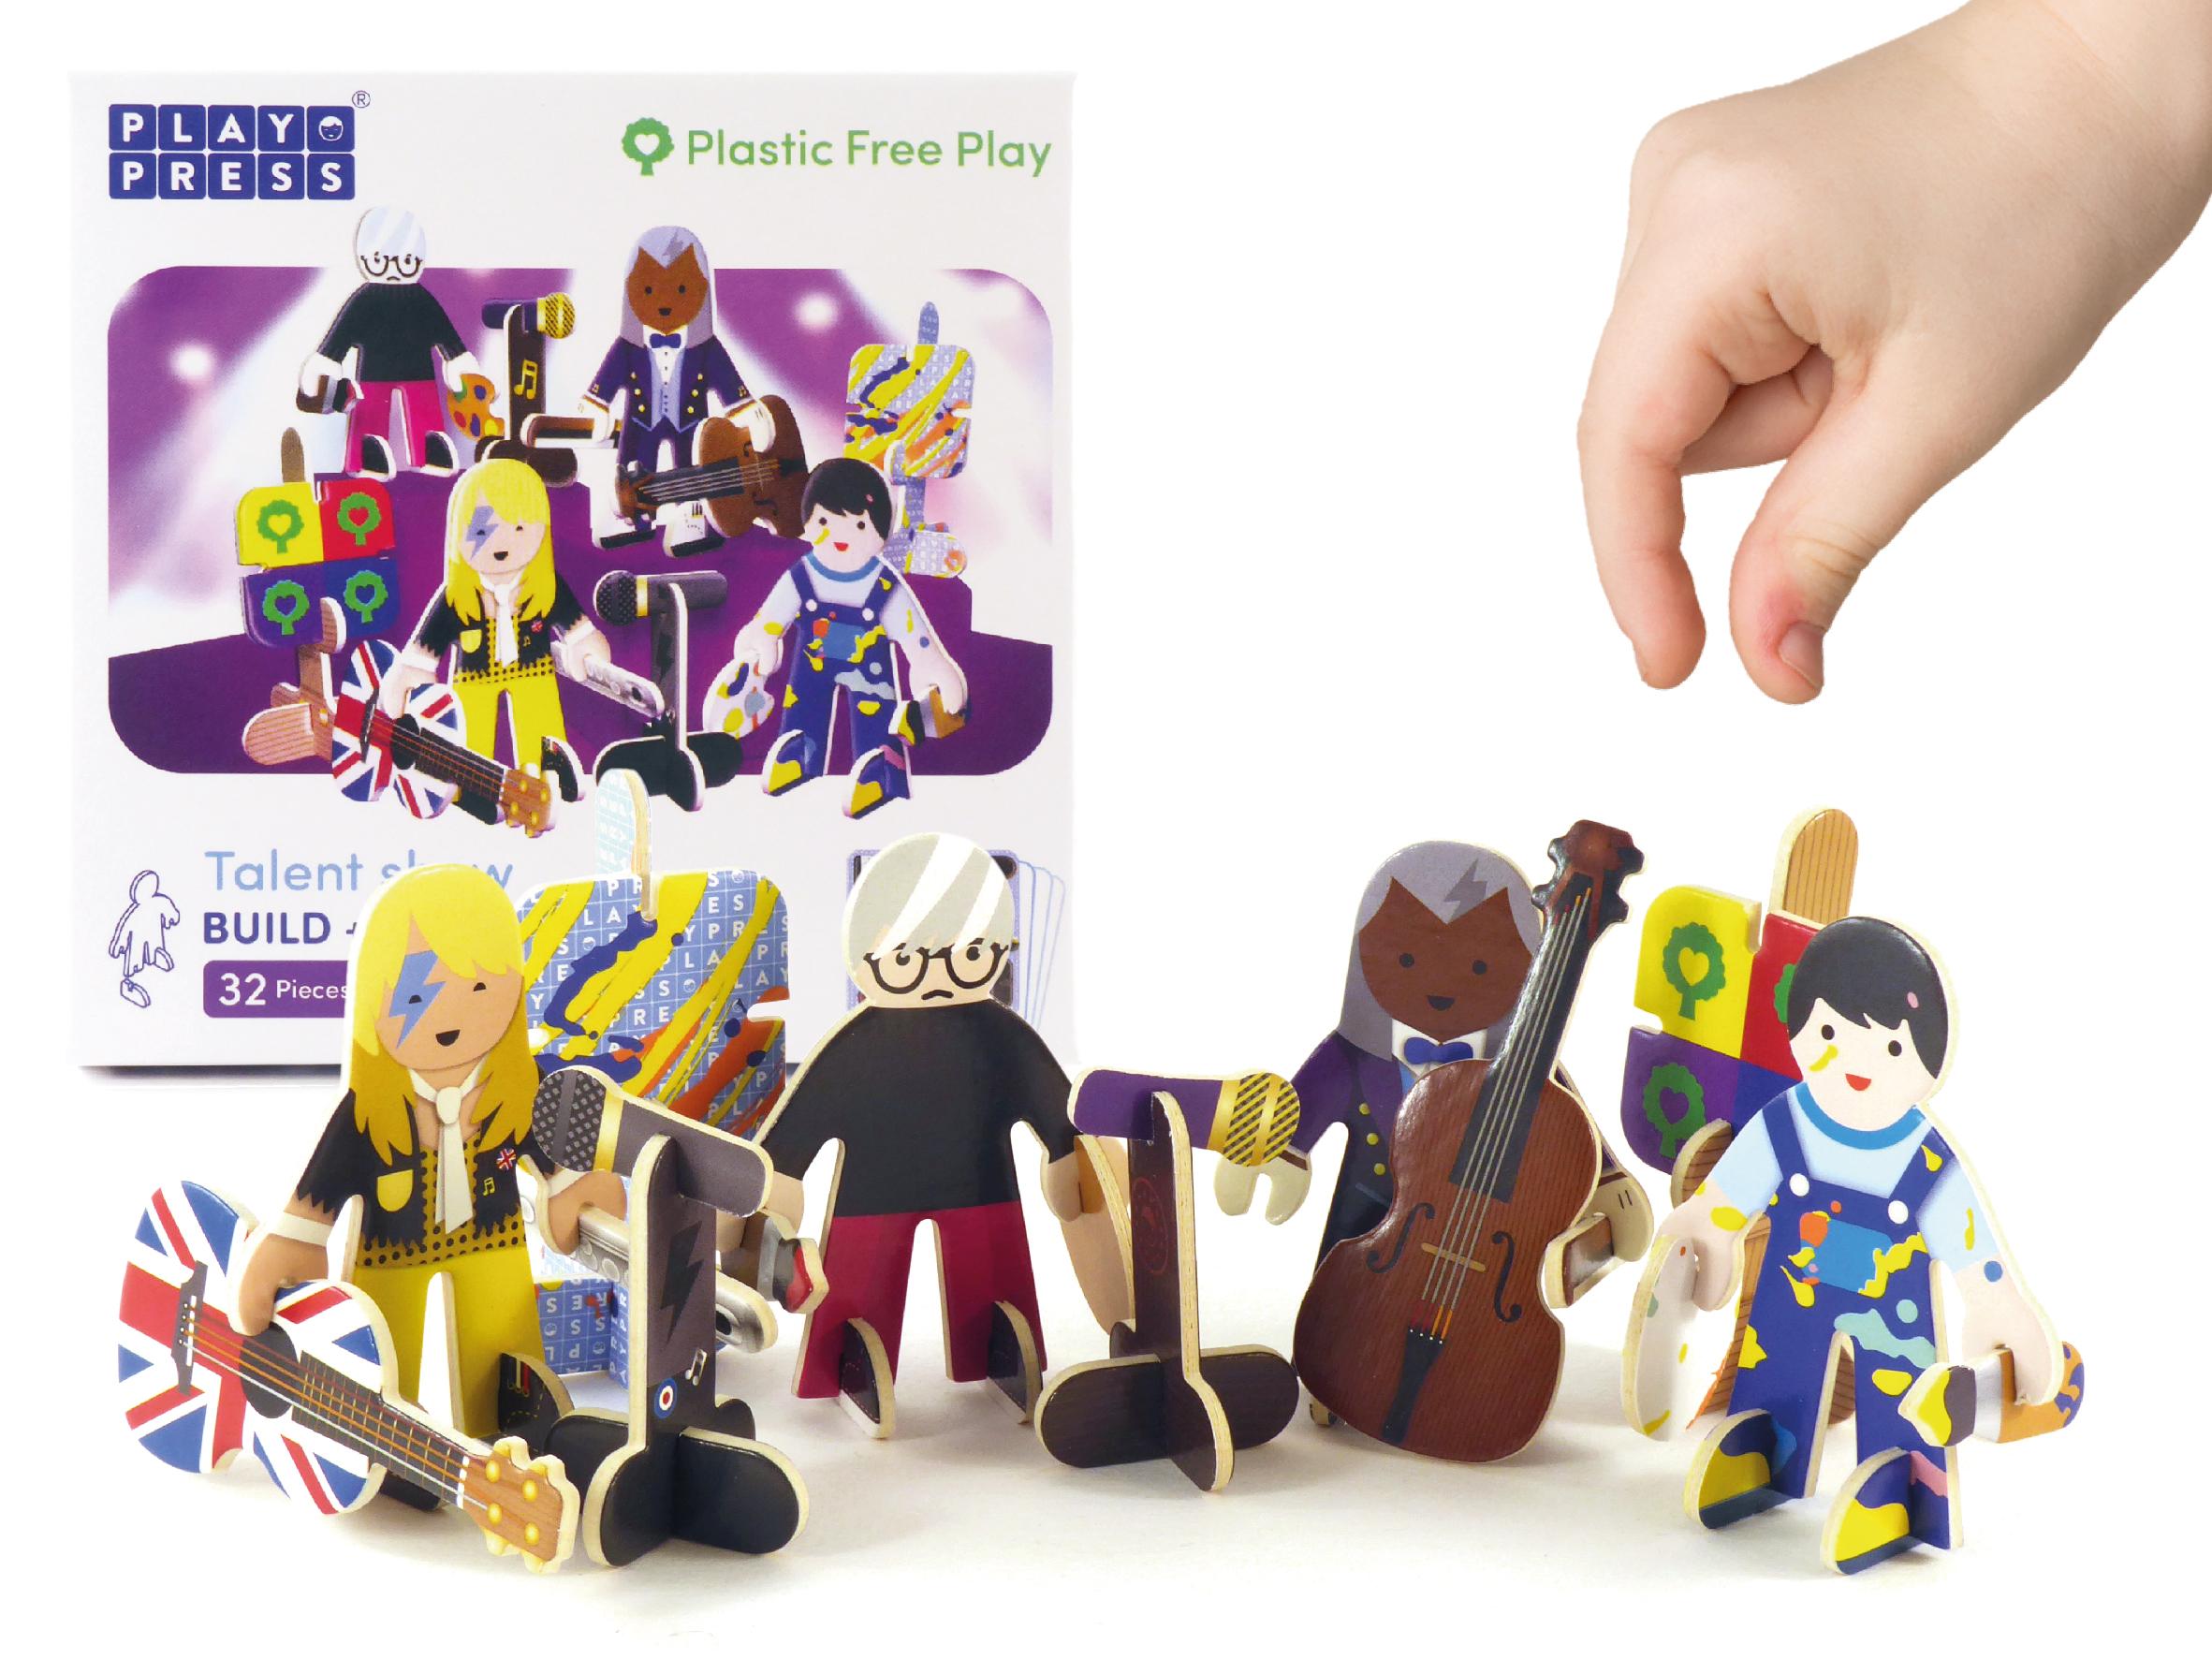 Play Press - Talent show Character Set